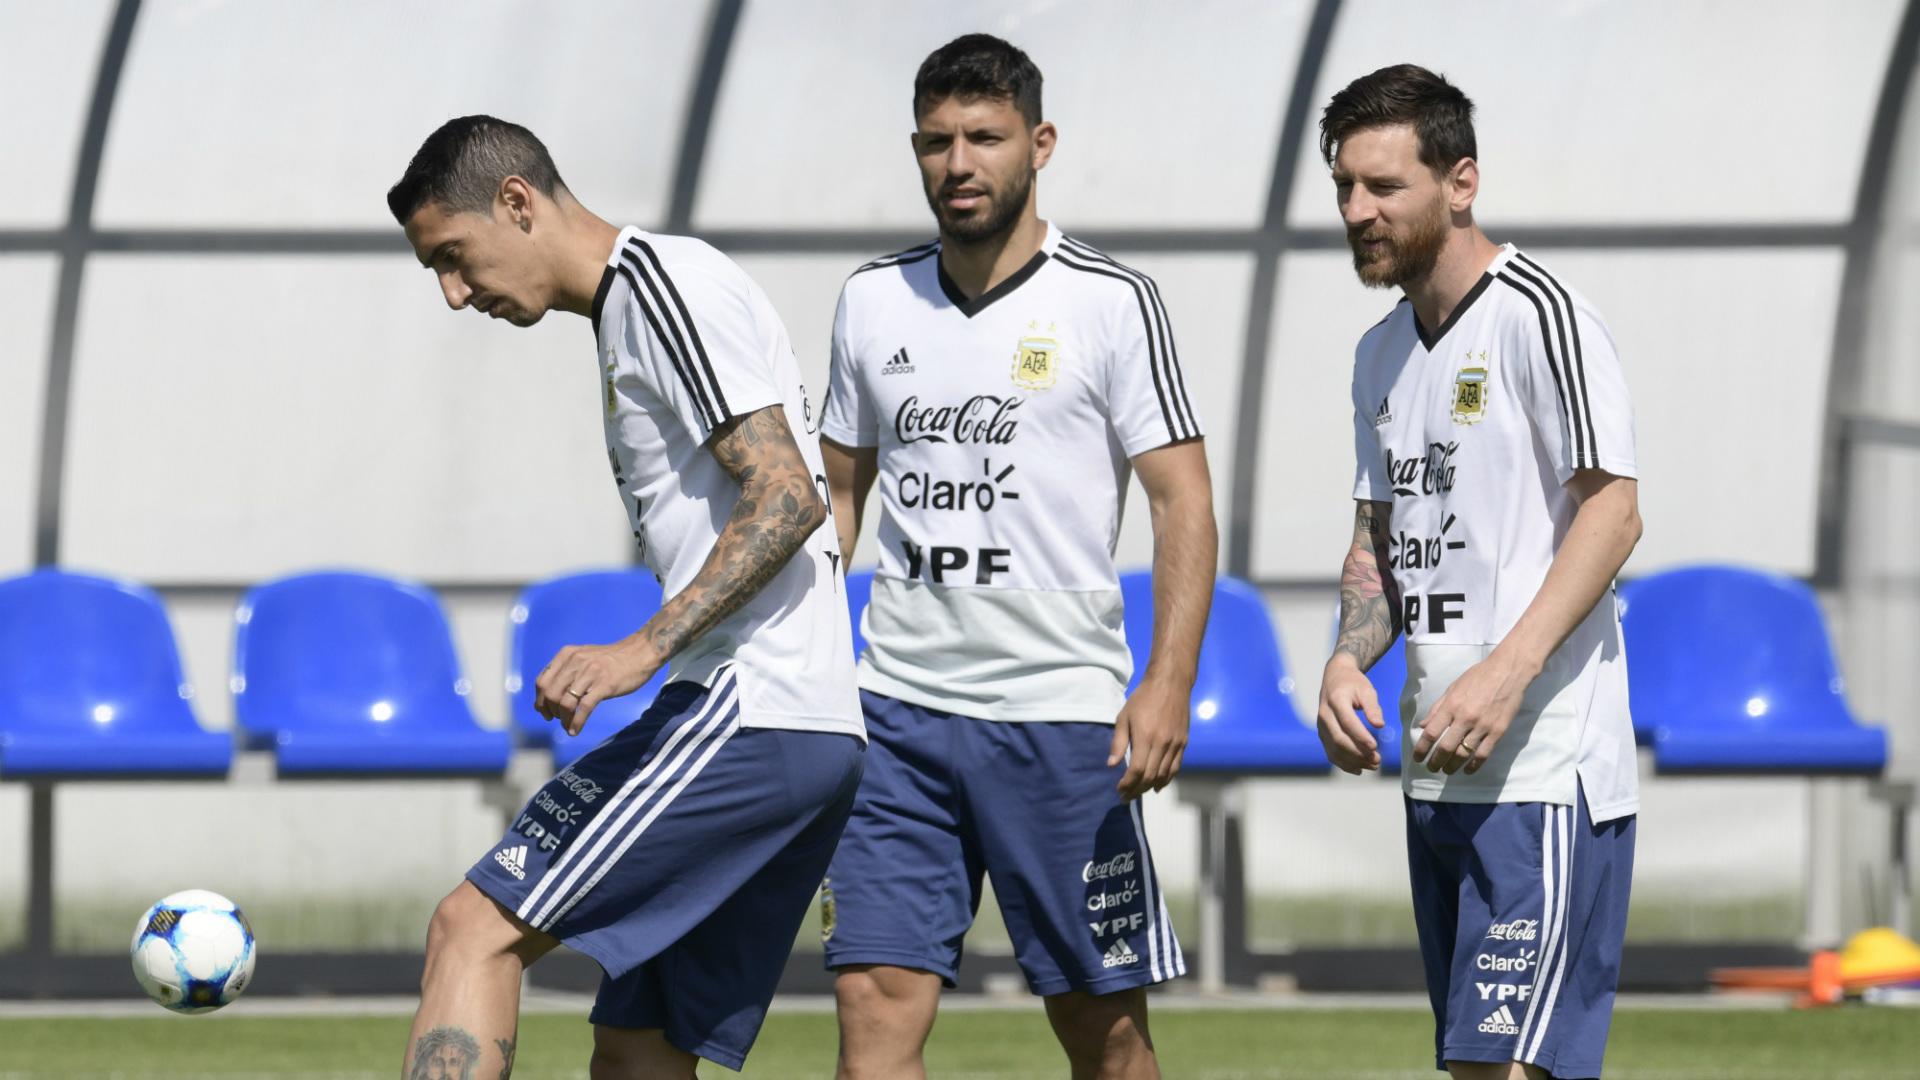 Confirmado: Di María vuelve a la Selección Argentina